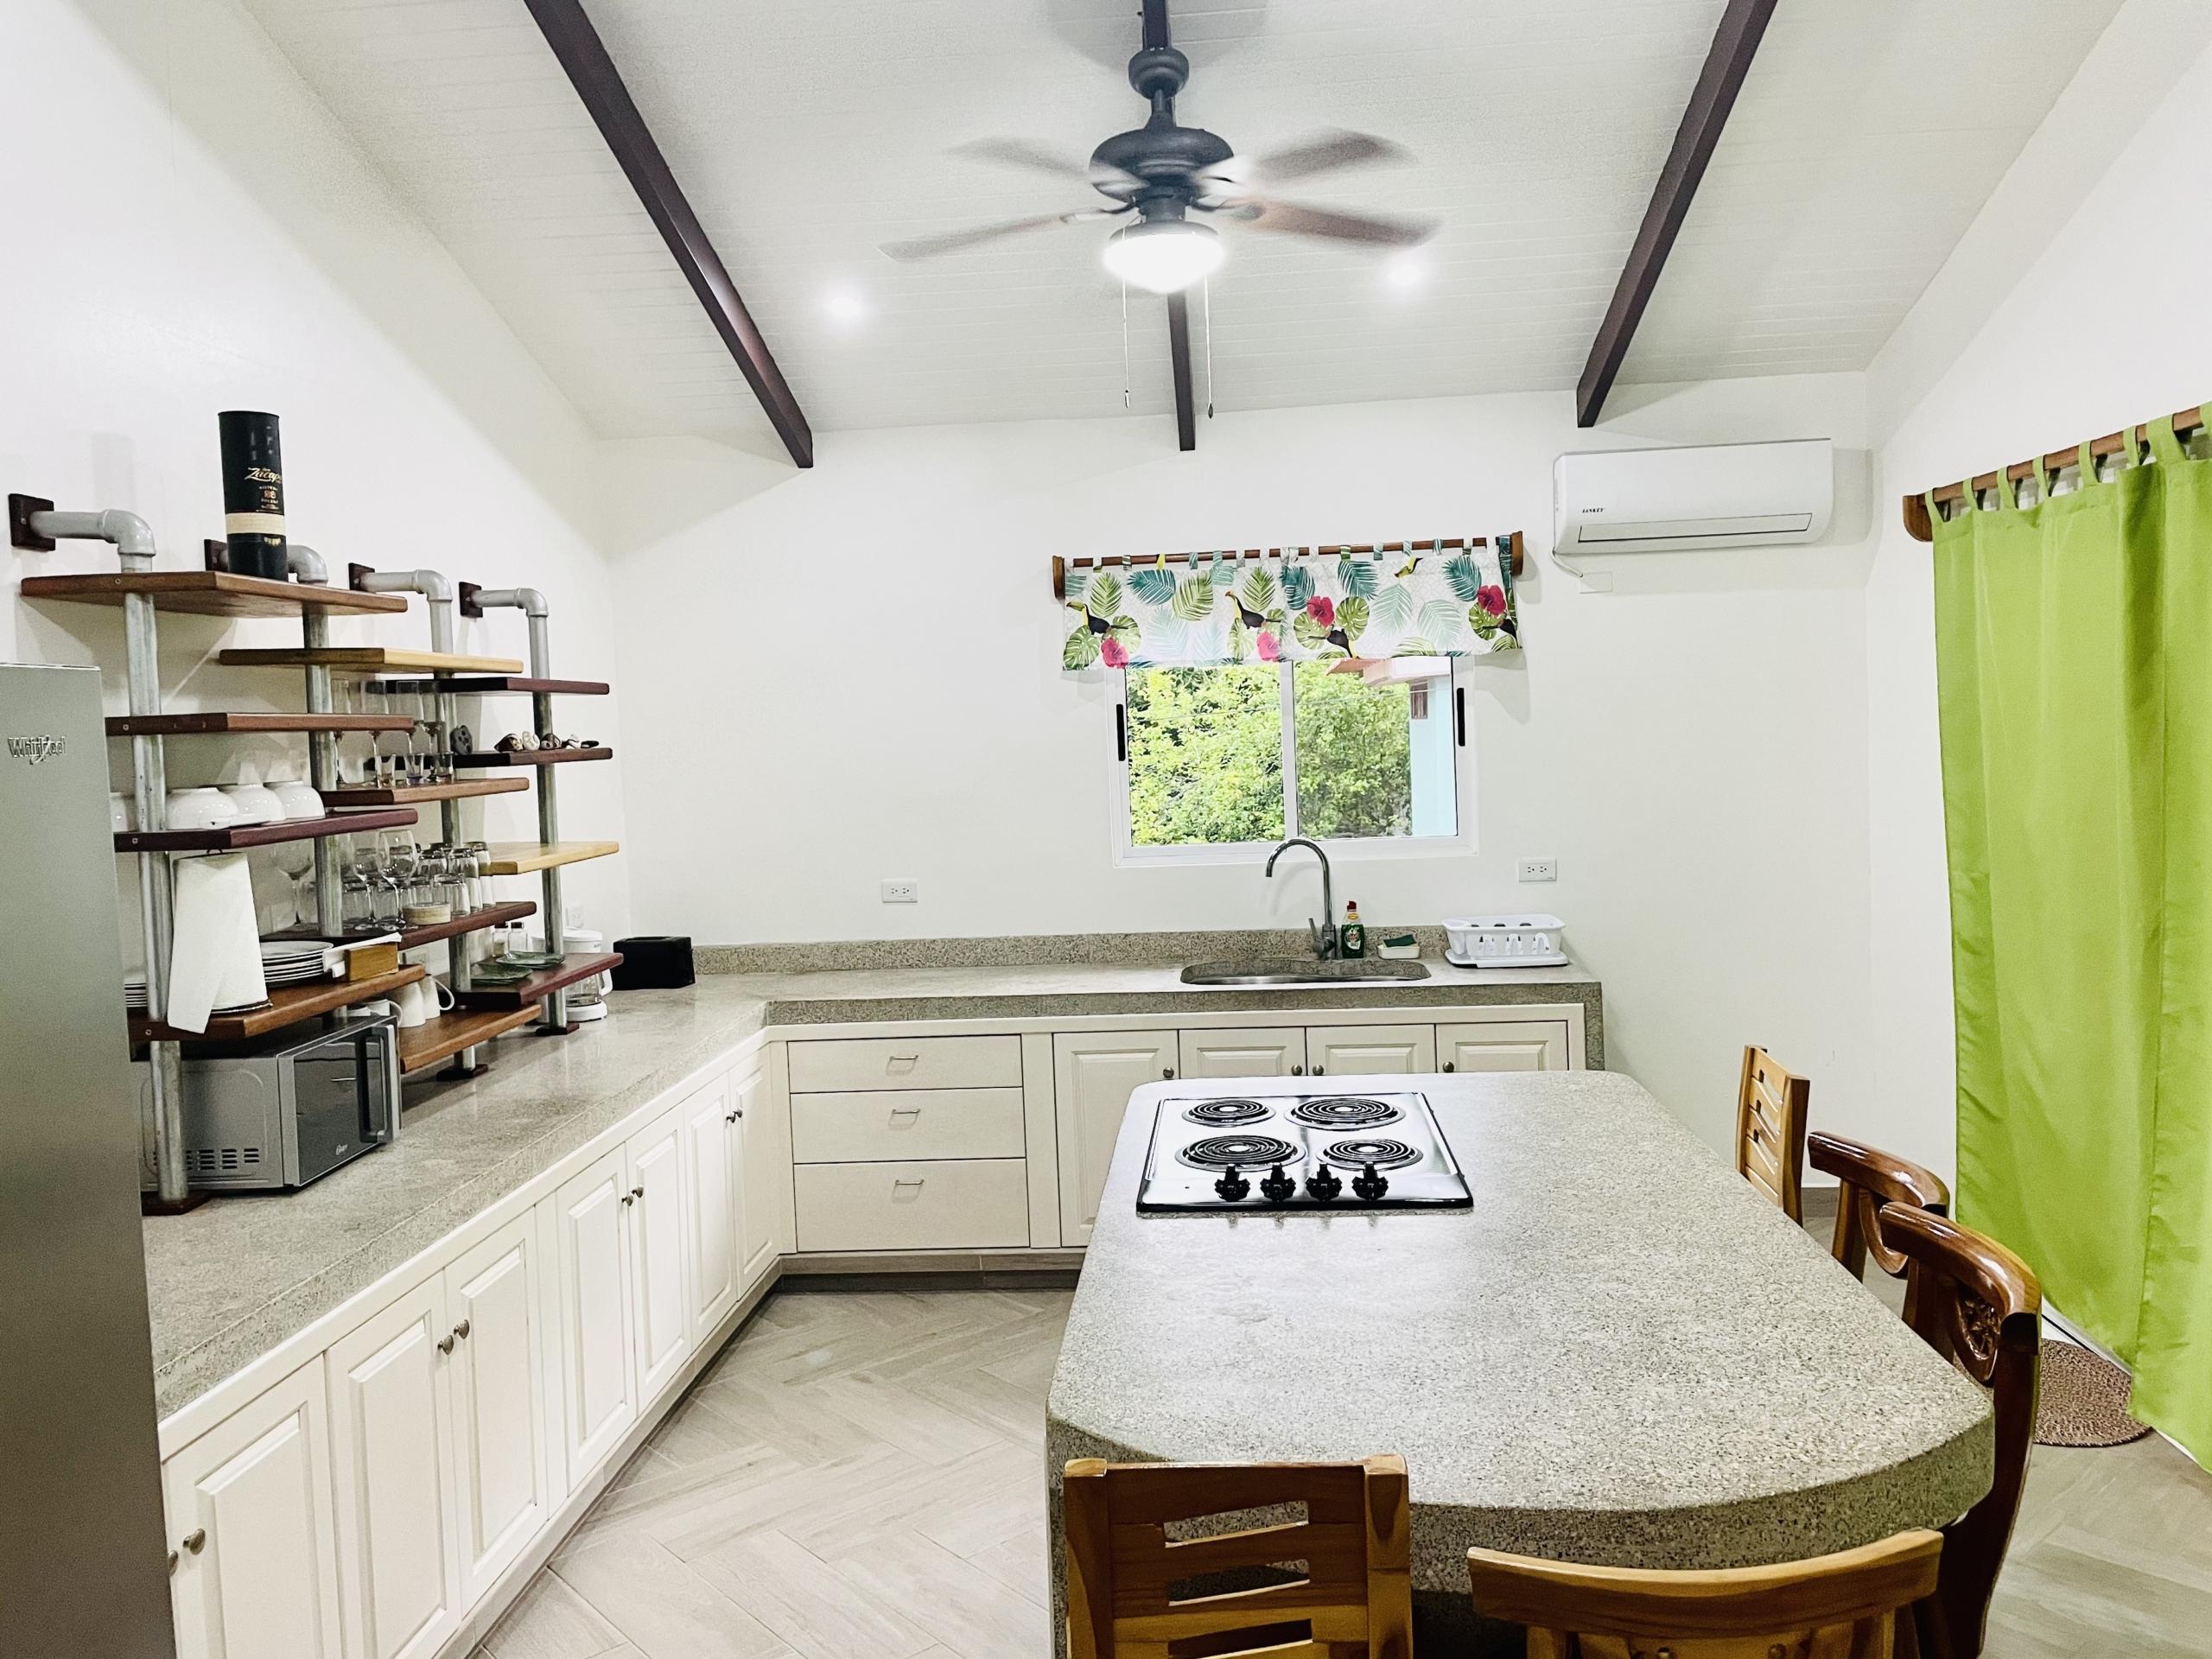 pelicano-dorado-kitchen-high-view